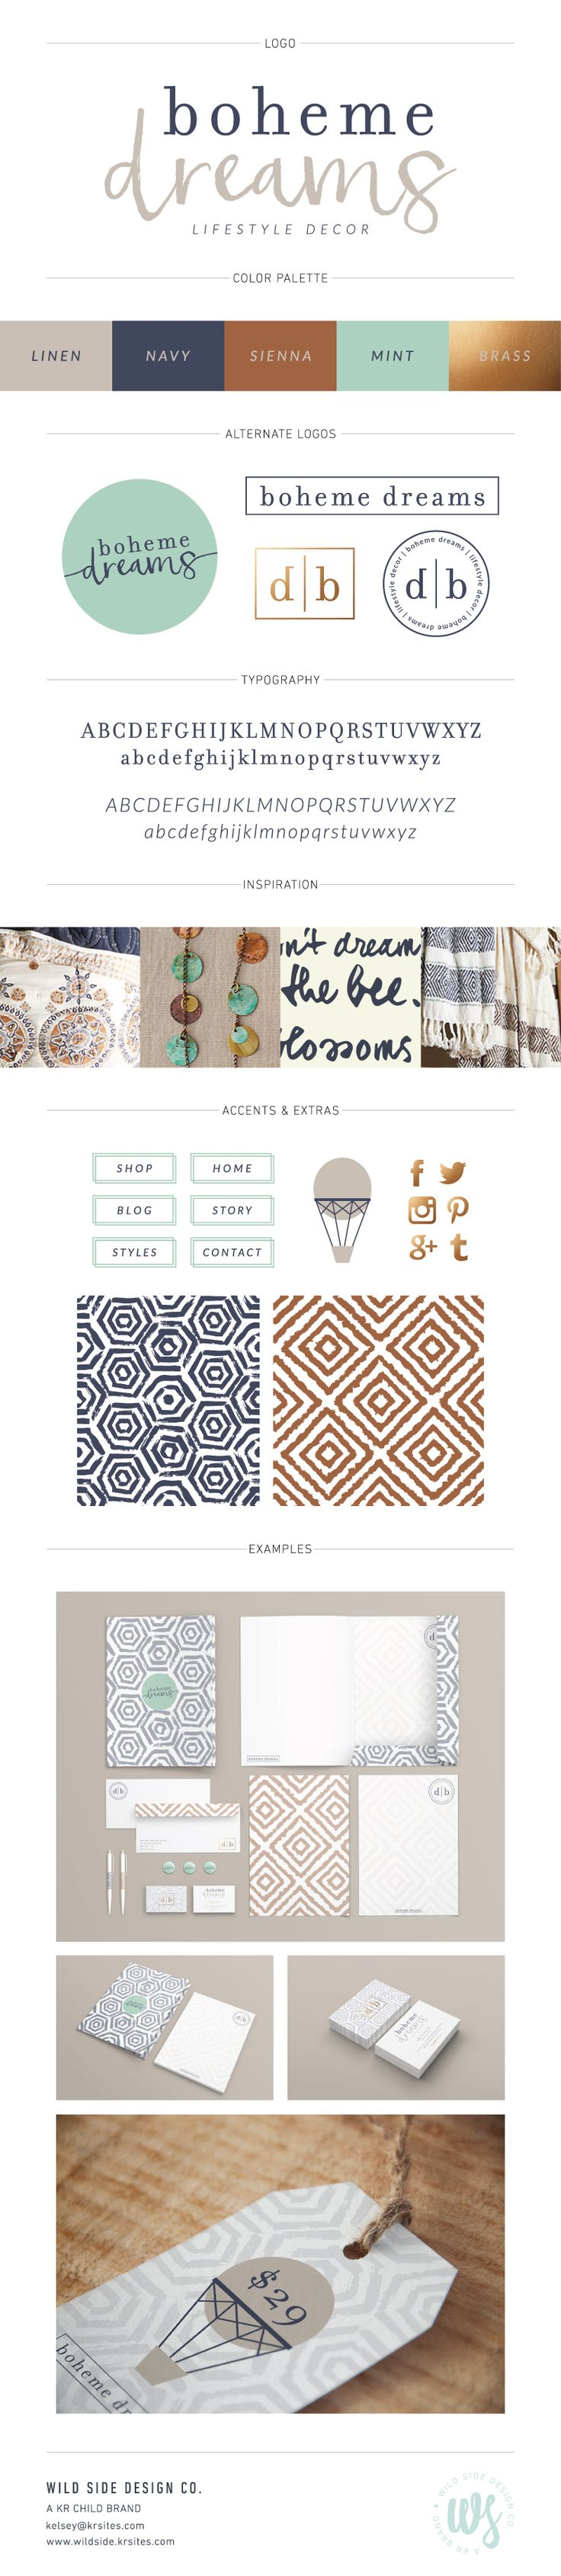 Brand Launch | Brand Style Board | Boho Home Decor Branding | Boheme Dreams Brand Design by Wild Side Design Co. | #branding www.wildside.krsites.com